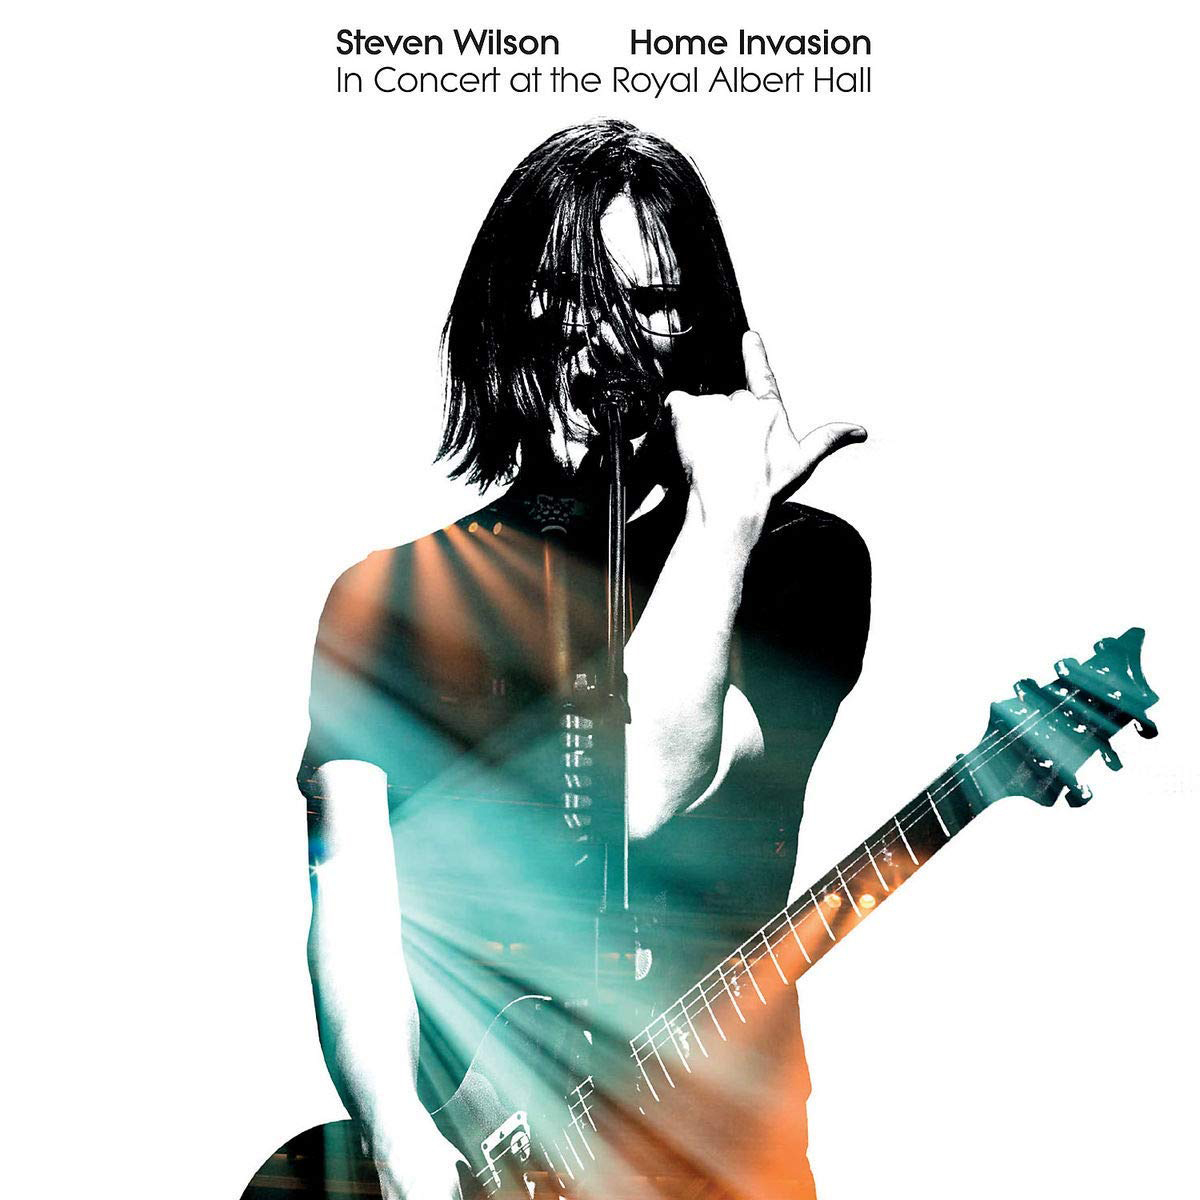 Стивен Уилсон Steven Wilson. Concert At The Royal Albert Hall (2 CD + Blu-ray) steven wilson steven wilson home invasion in concert at the royal albert hall 5 lp